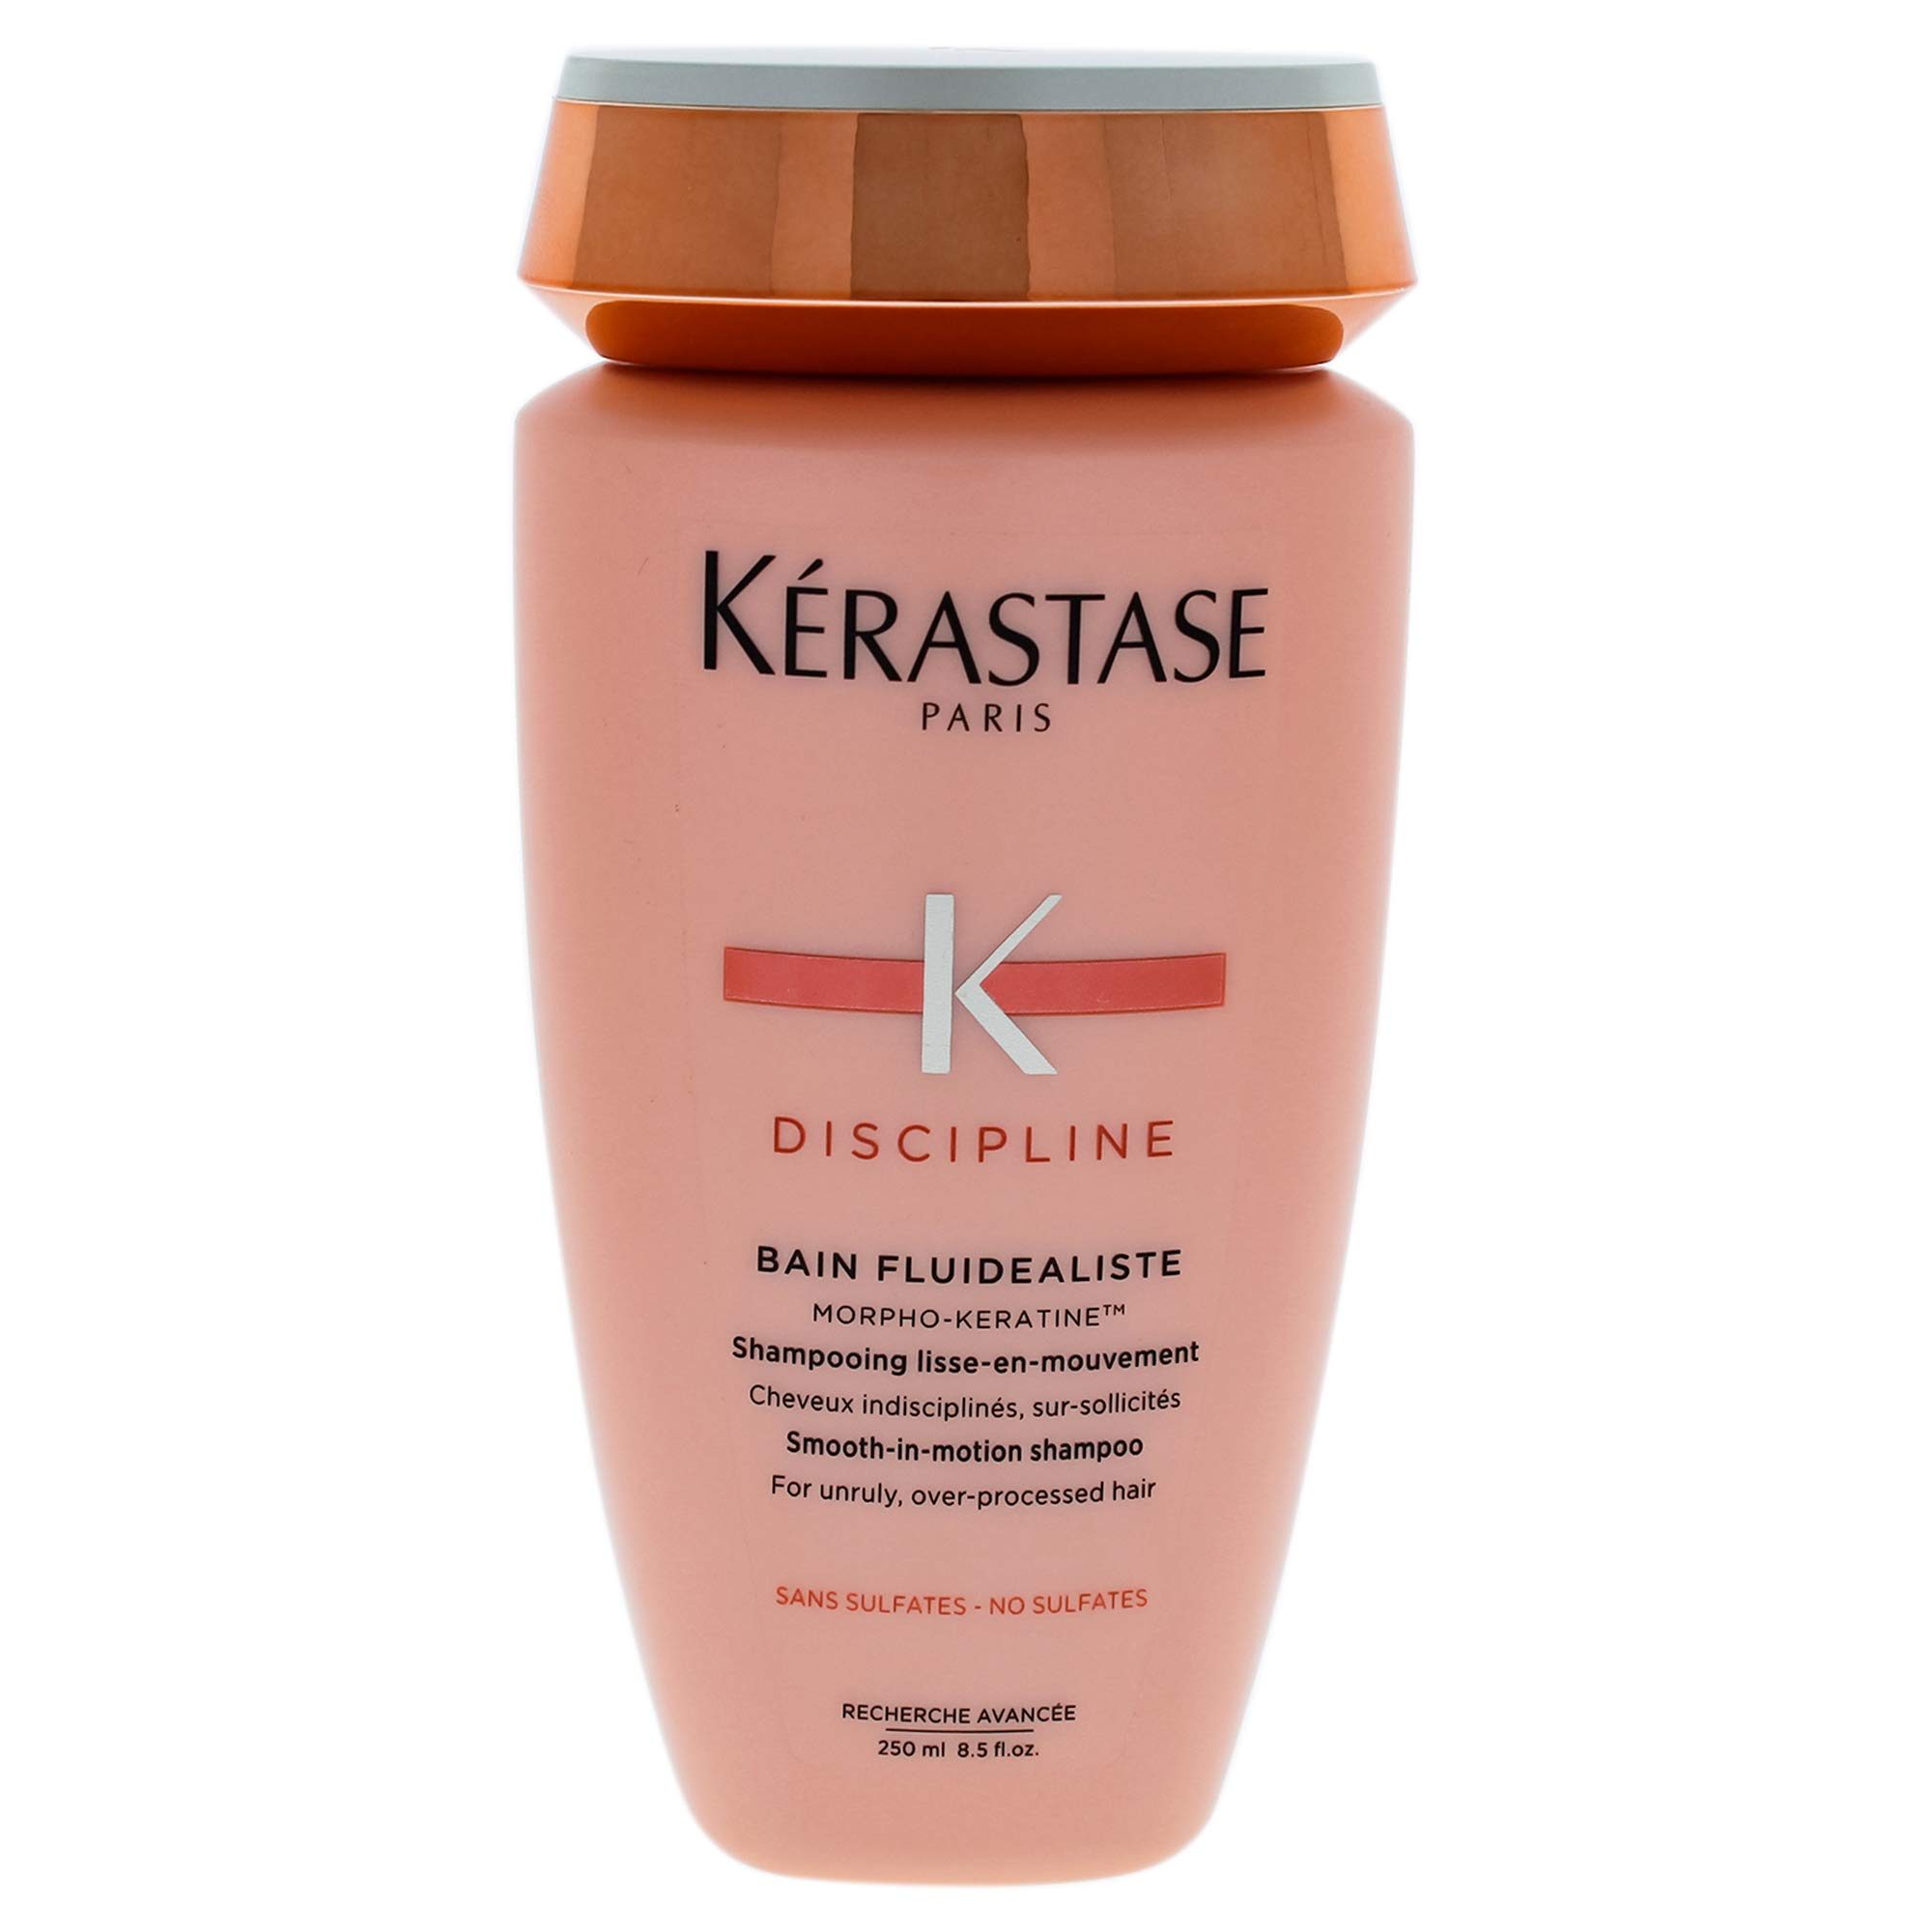 Kerastase Discipline Bain Fluidealiste Sulfate-FREE Shampoo, 8.5 Ounce by KERASTASE